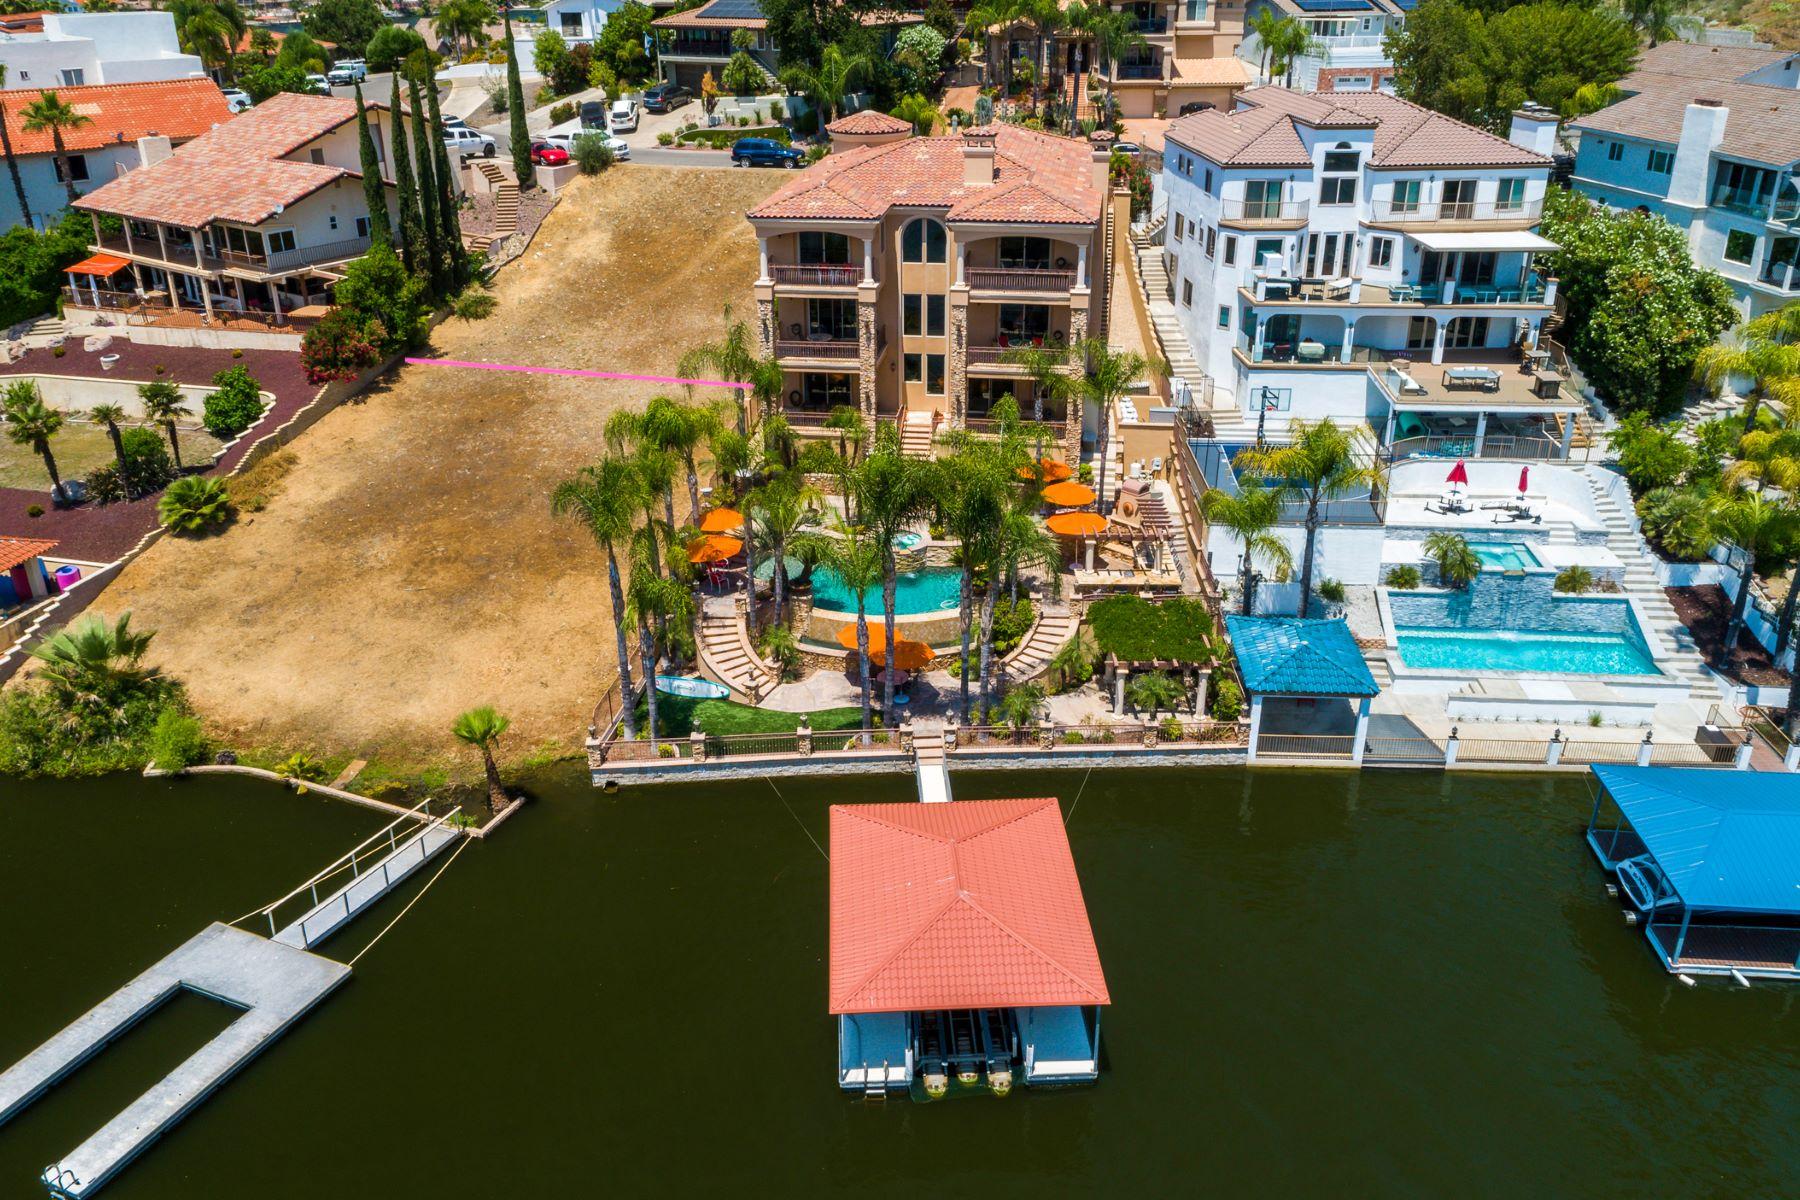 Single Family Homes for Active at 22216 San Joaquin Drive W Canyon Lake, California 92587 United States